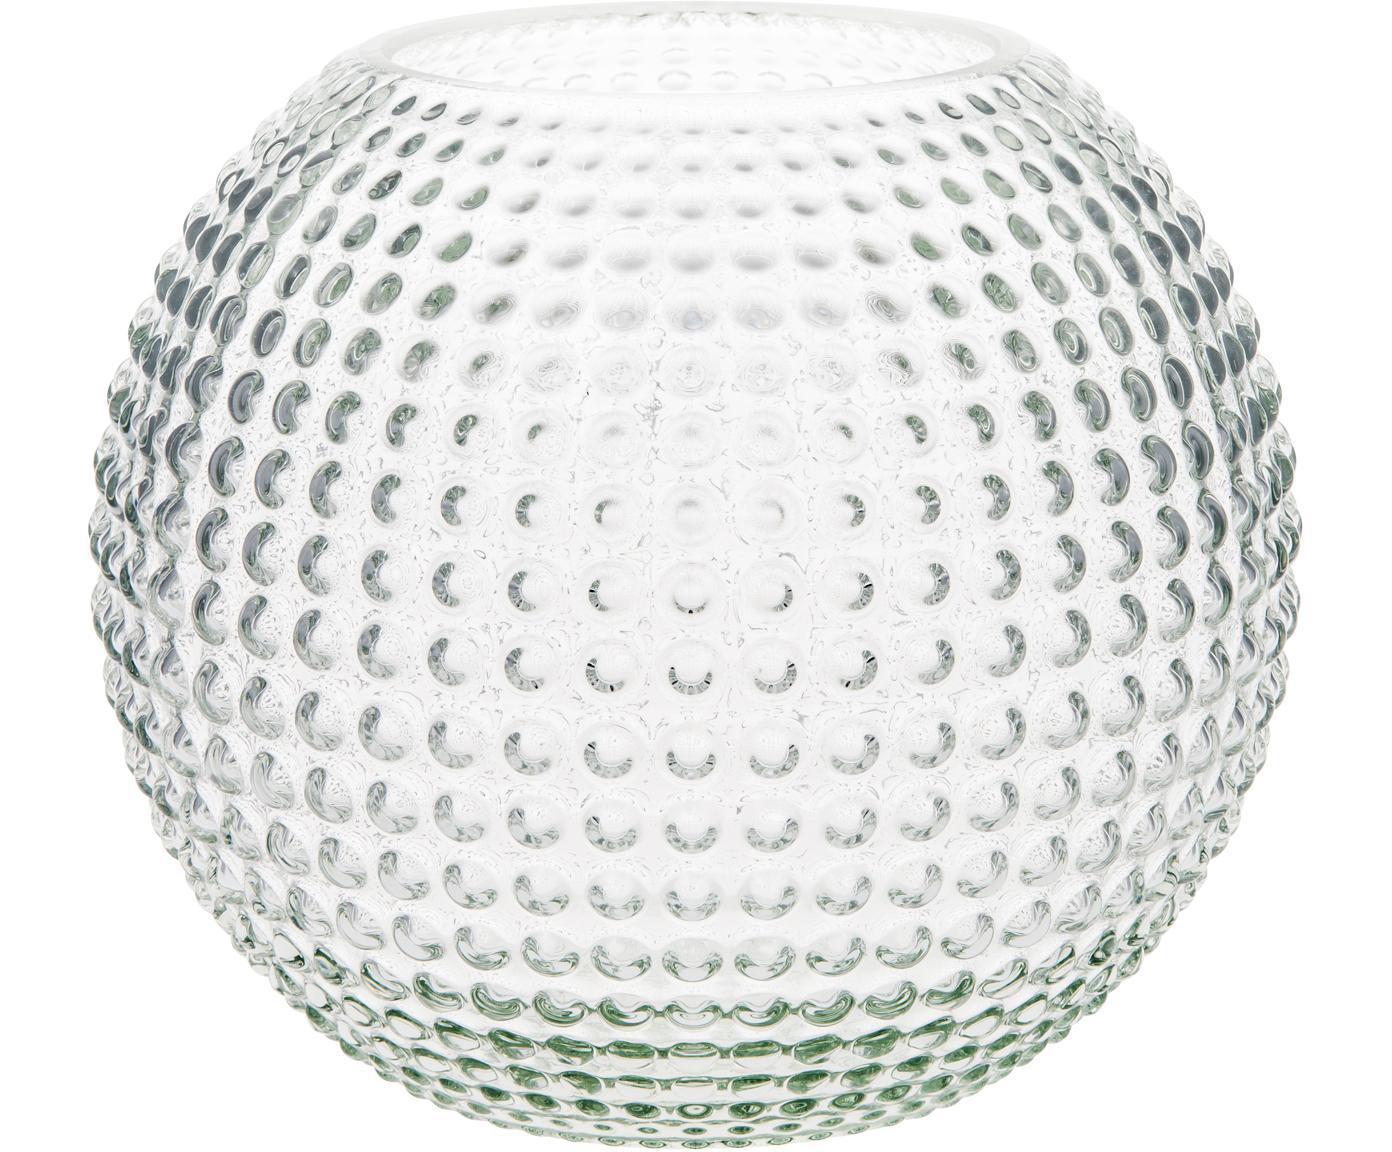 Vaso in vetro Flora, Vetro, Trasparente, Ø 15 x Alt. 13 cm